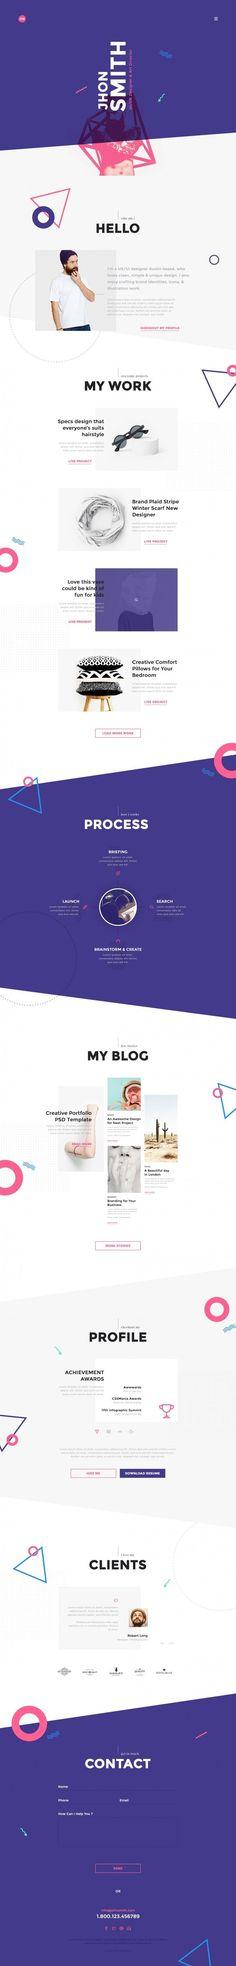 Me Creative Portfolio Web Design (Designer Unknown)